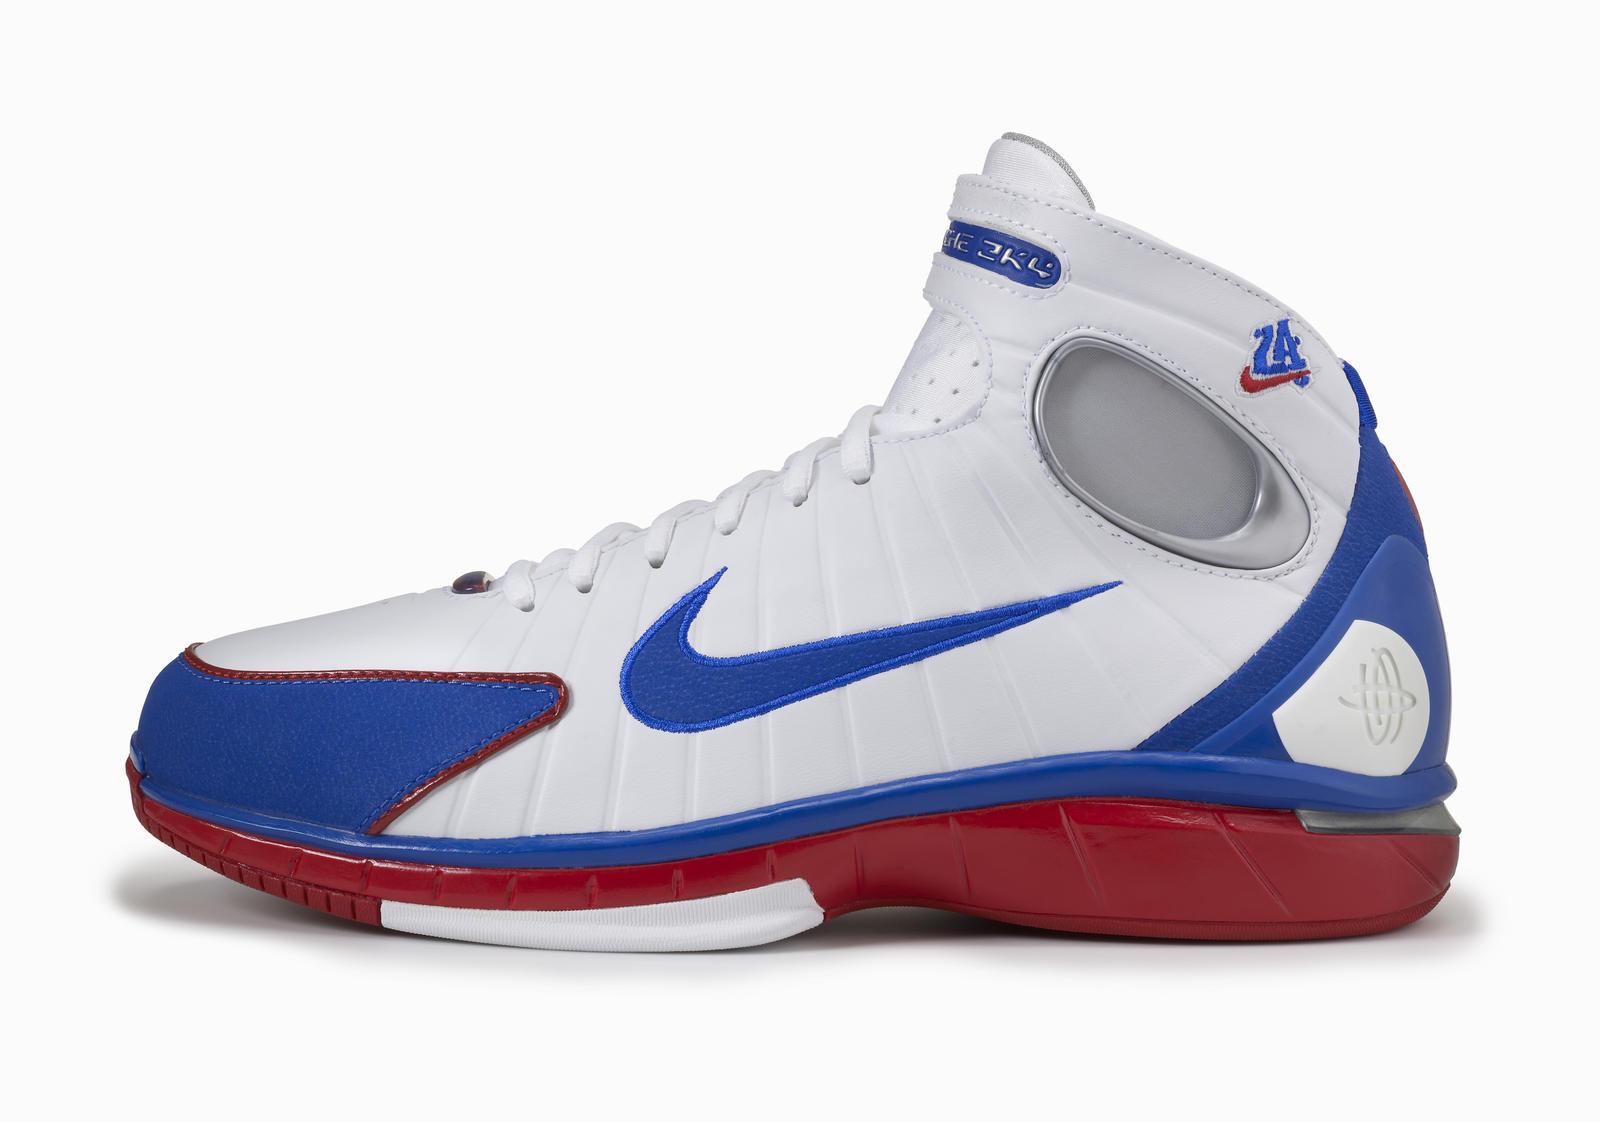 Nike Air Huarache Basketball Shoes